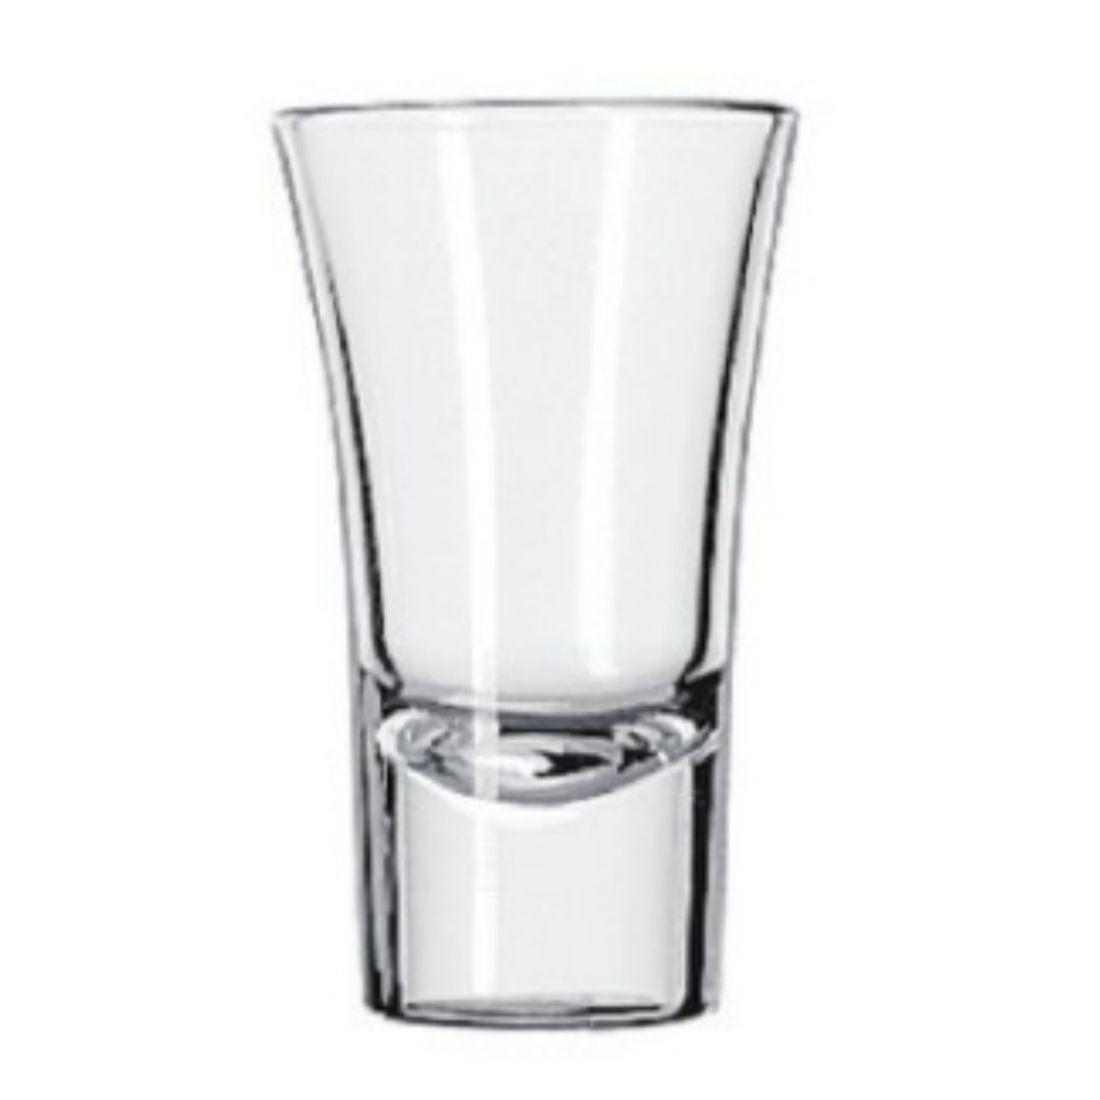 Shooter sklenička na whisky 5,6 cl